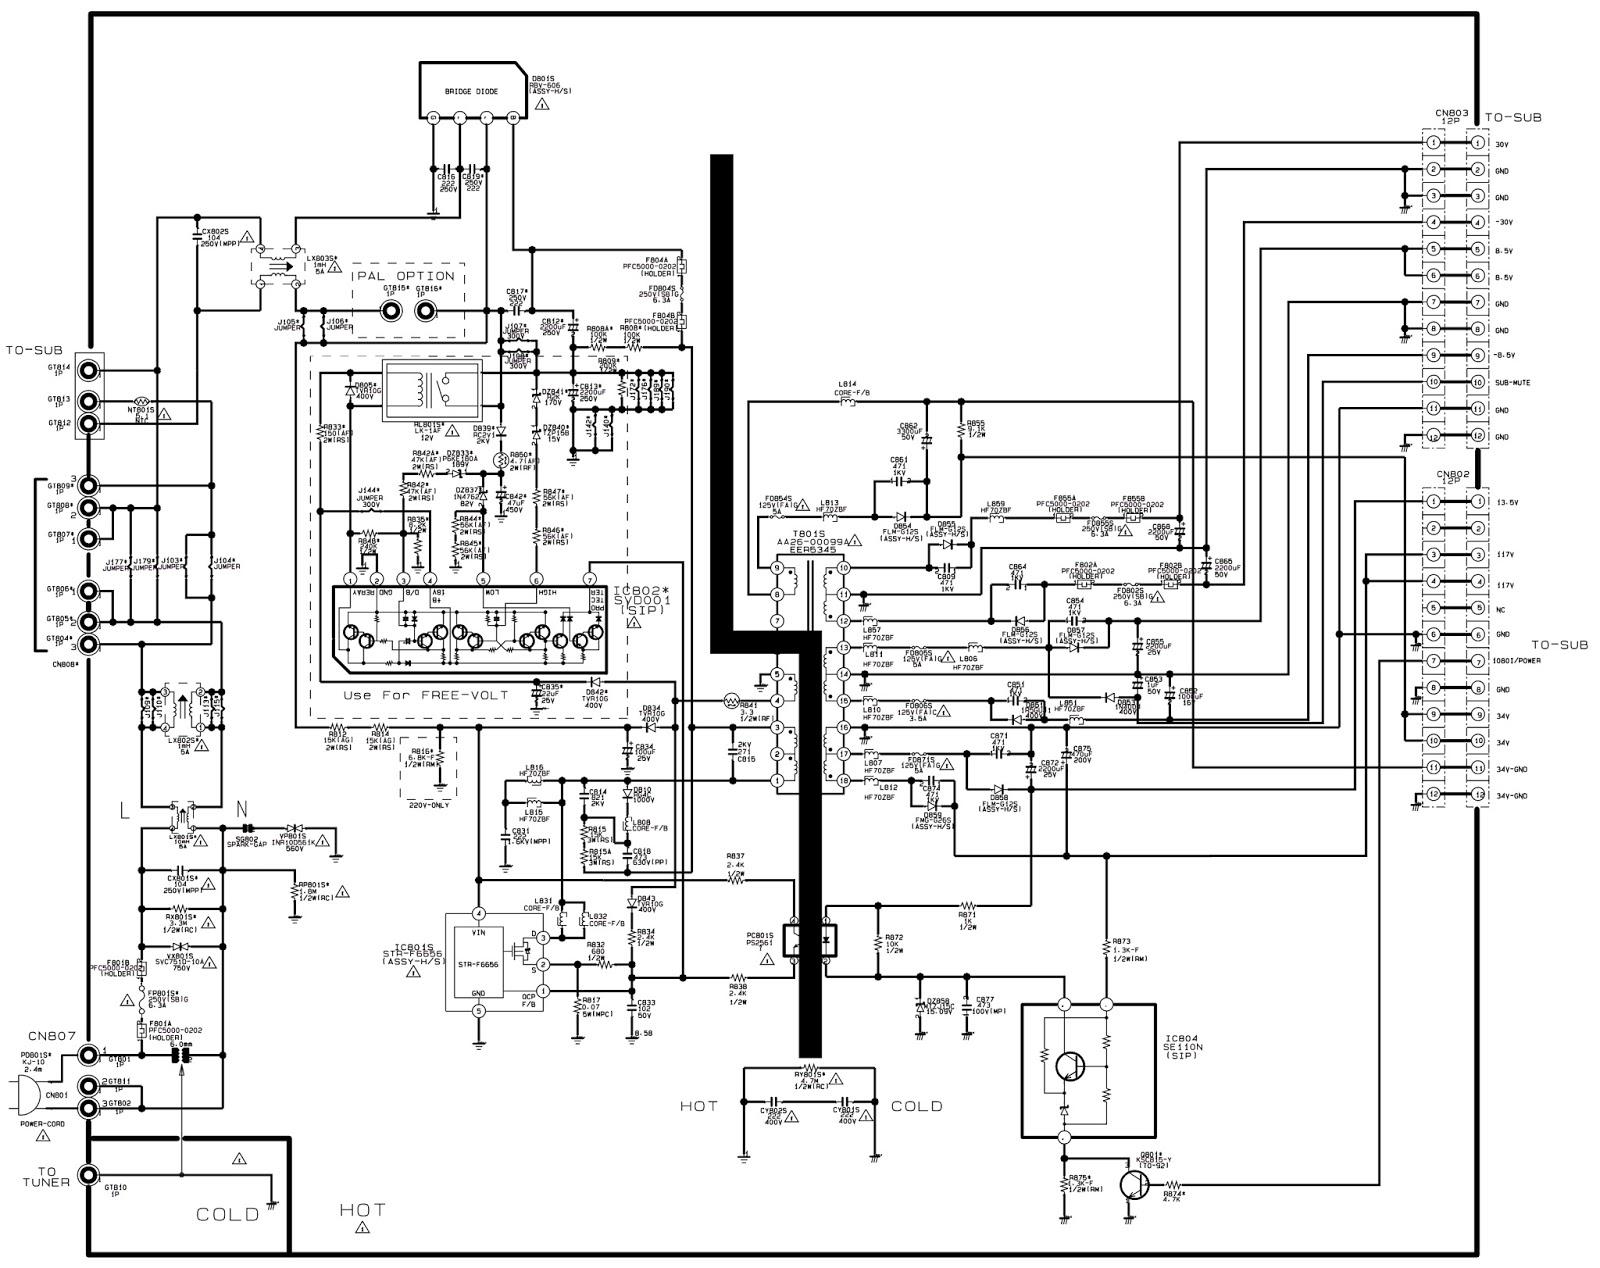 rptv - samsung - pcl545 - pcl6215 - hcl552wx